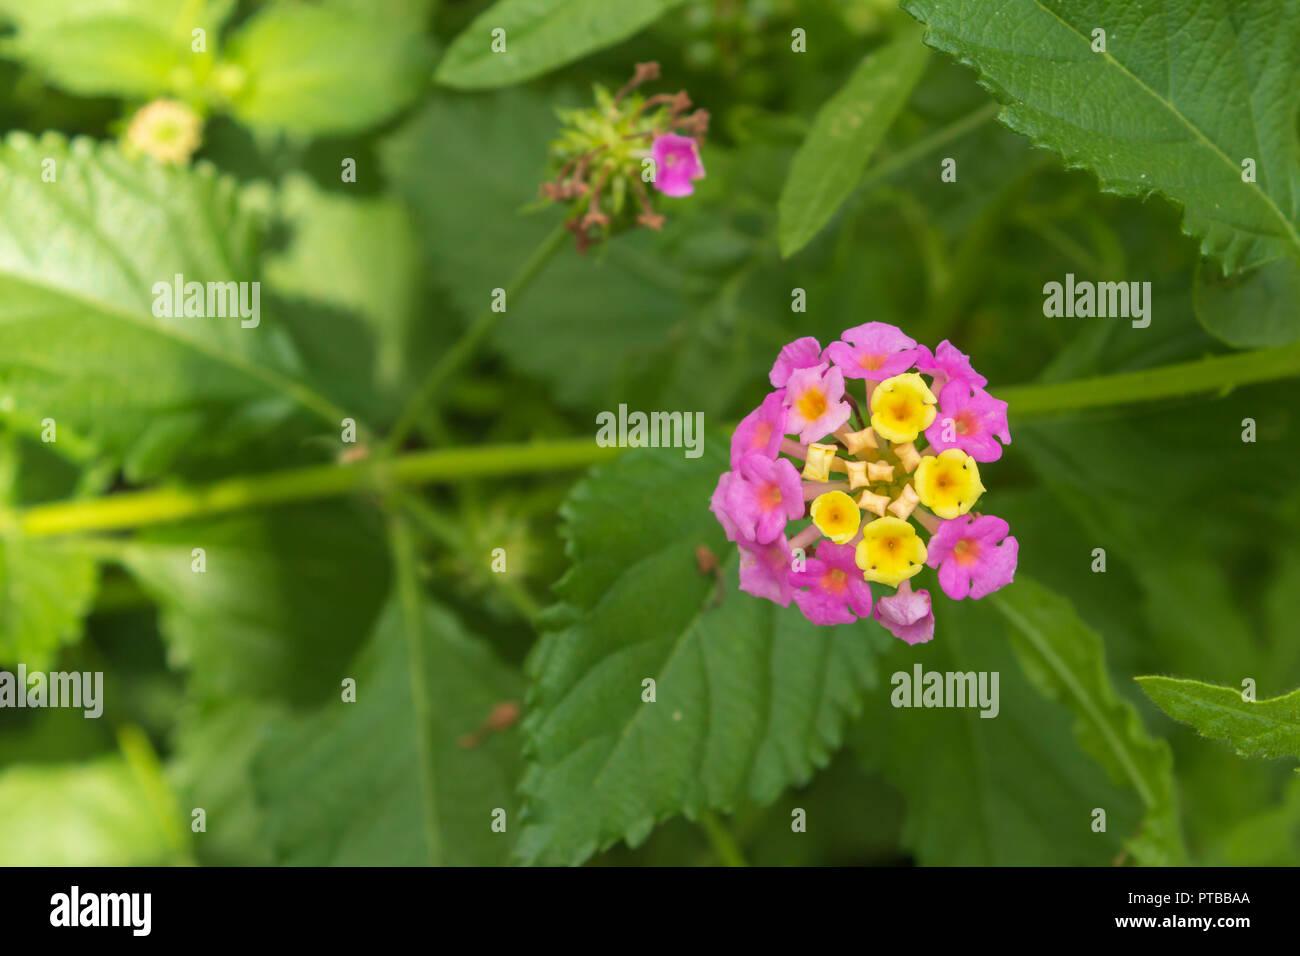 Lantana camara flower, October 2018, Spain Stock Photo